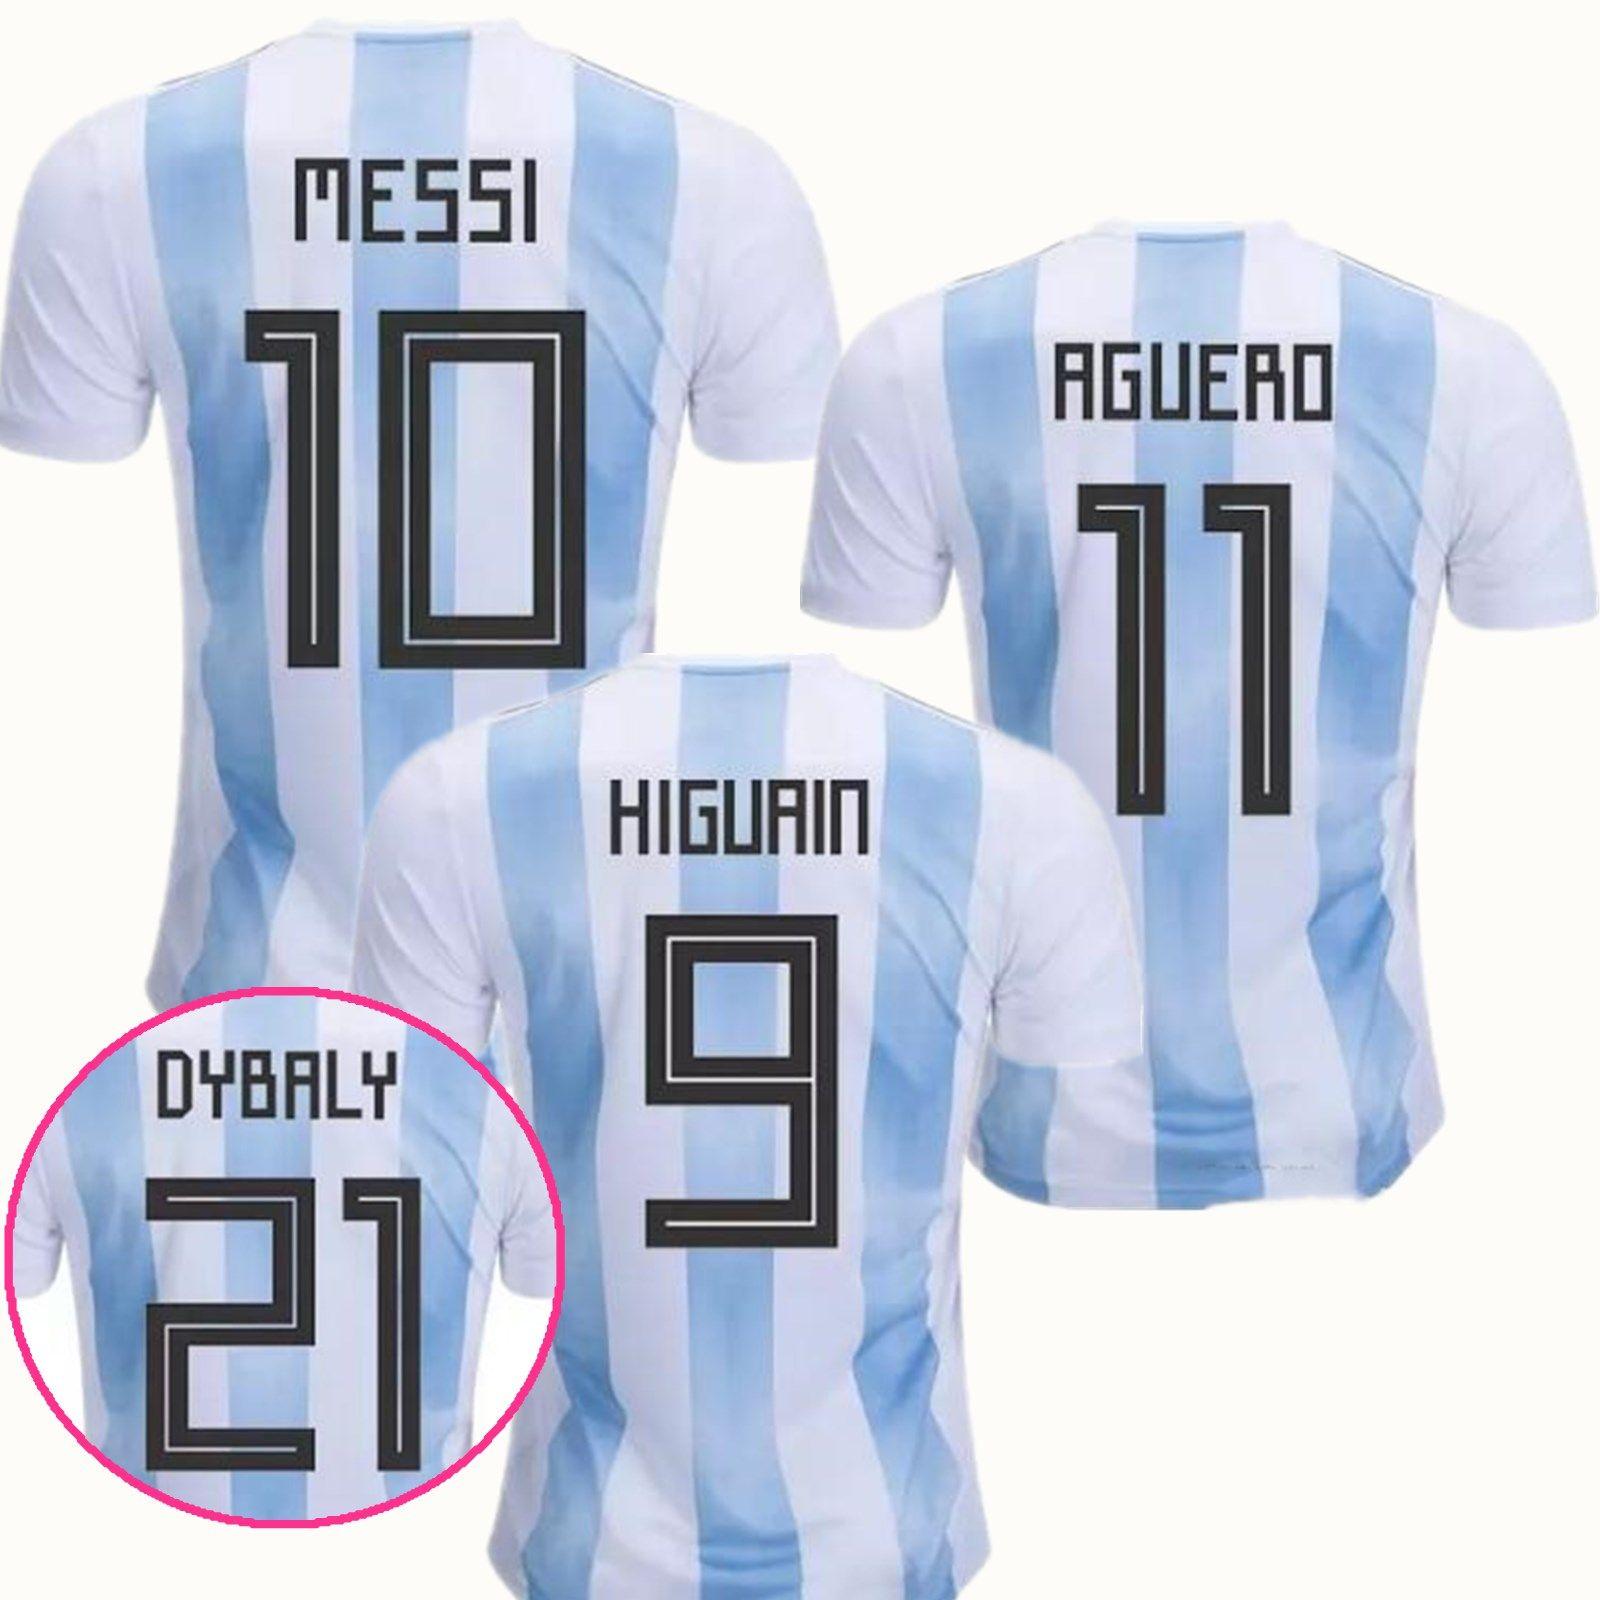 best deals on 1460c 61e6e 2018 Argentina World Cup Jersey 10 MESSI DI MARIA AGUERO KOMPANY DYBALA  Higuain Home Blue Away Adults Argentina Soccer Jersey football shirt